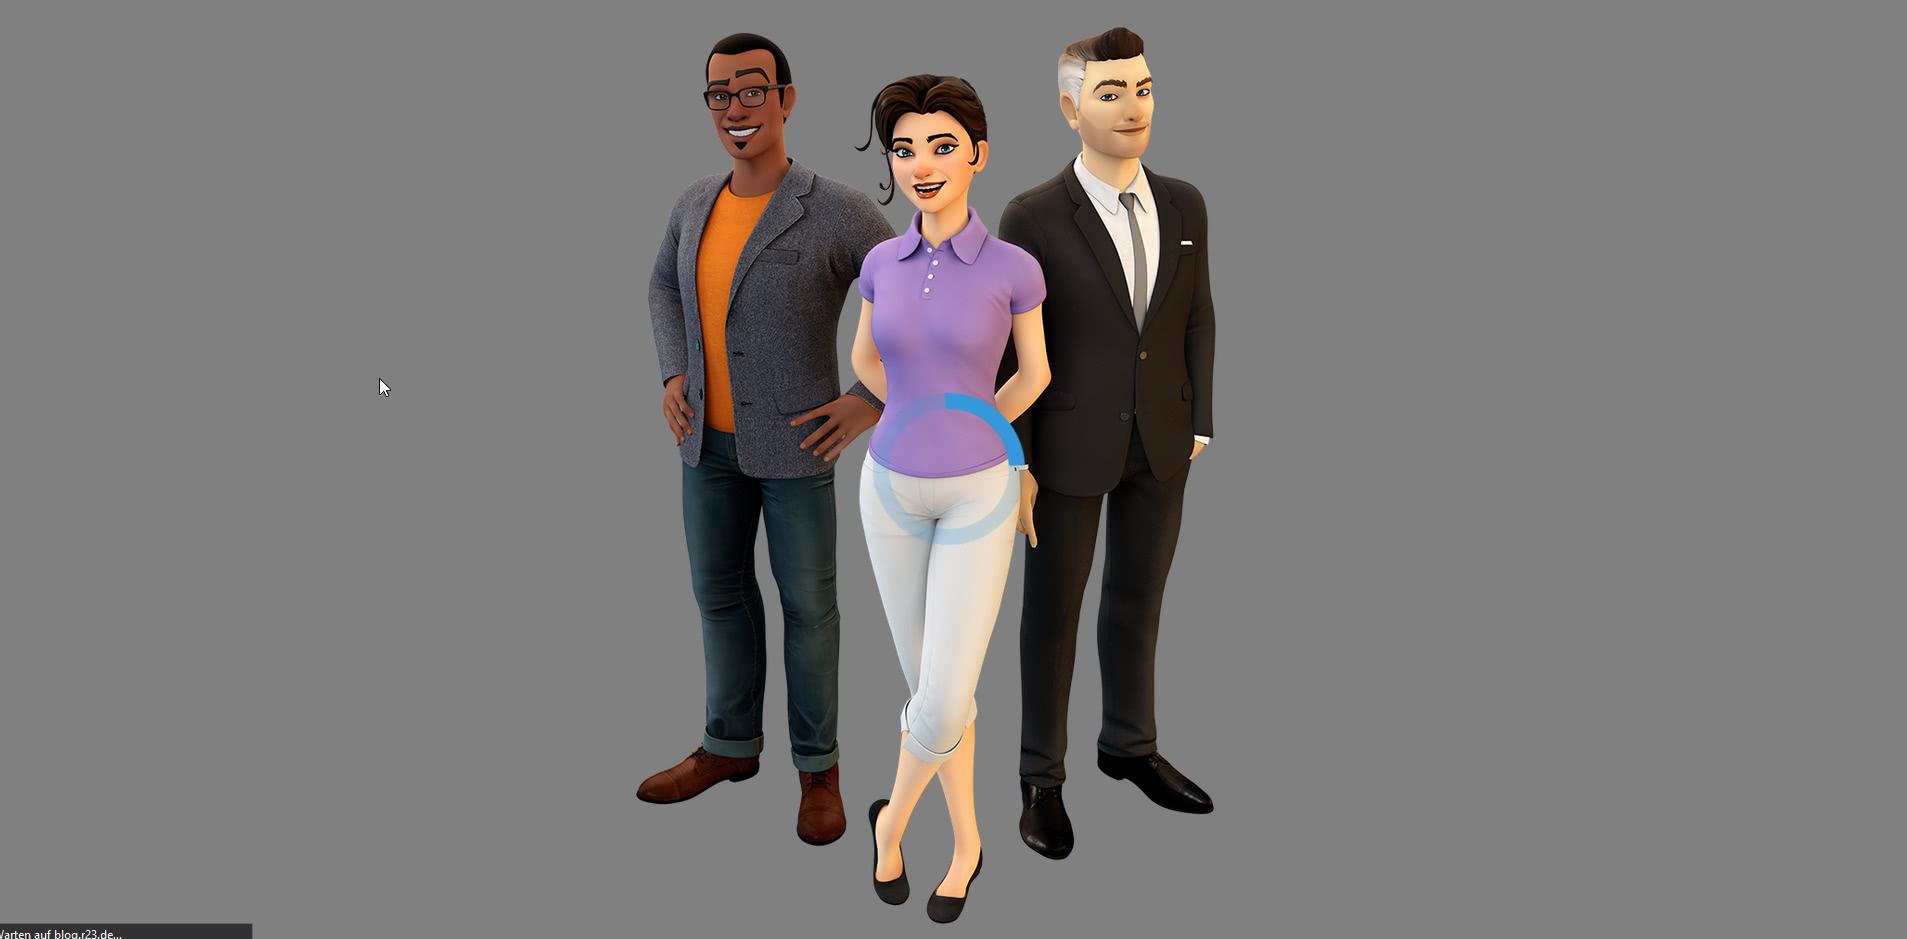 Interaktive animierte 3D-Charaktere im Web